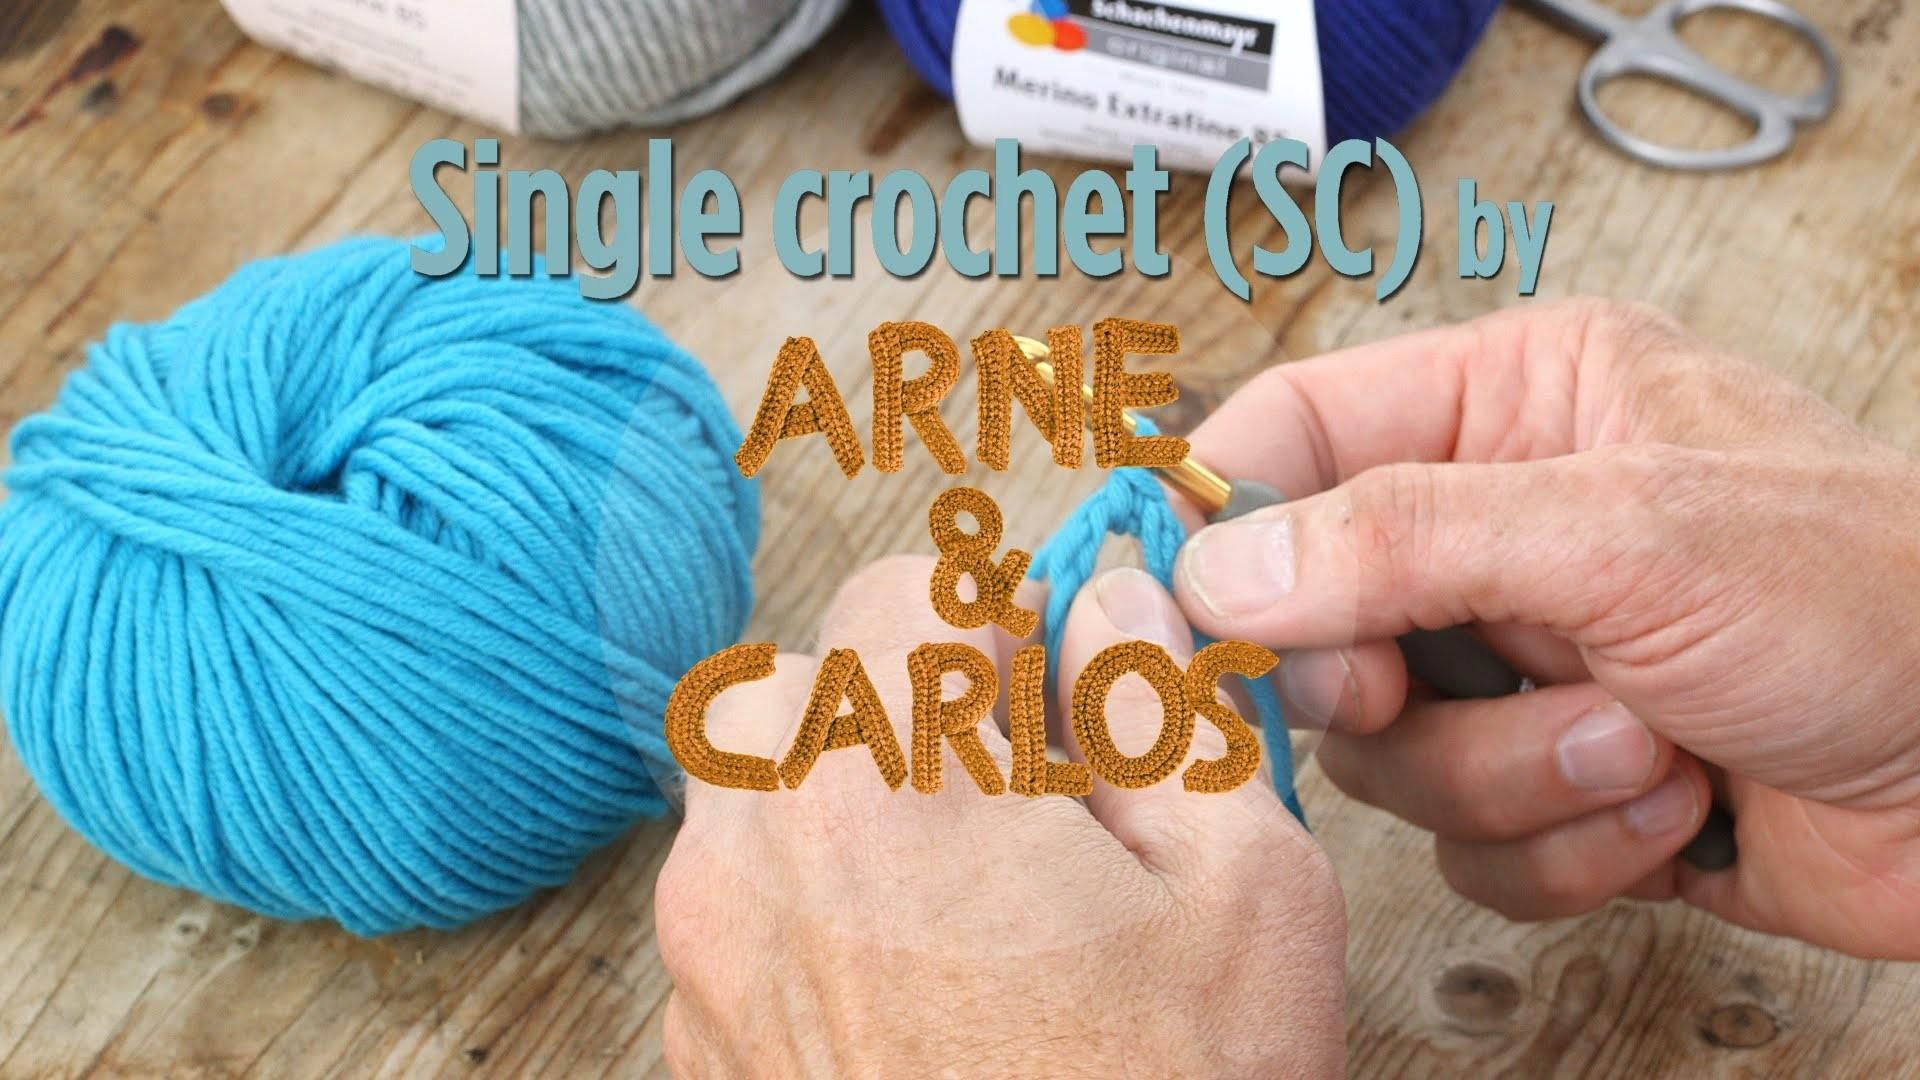 How to crochet - 3. Making a single crochet stitch - by ARNE&CARLOS